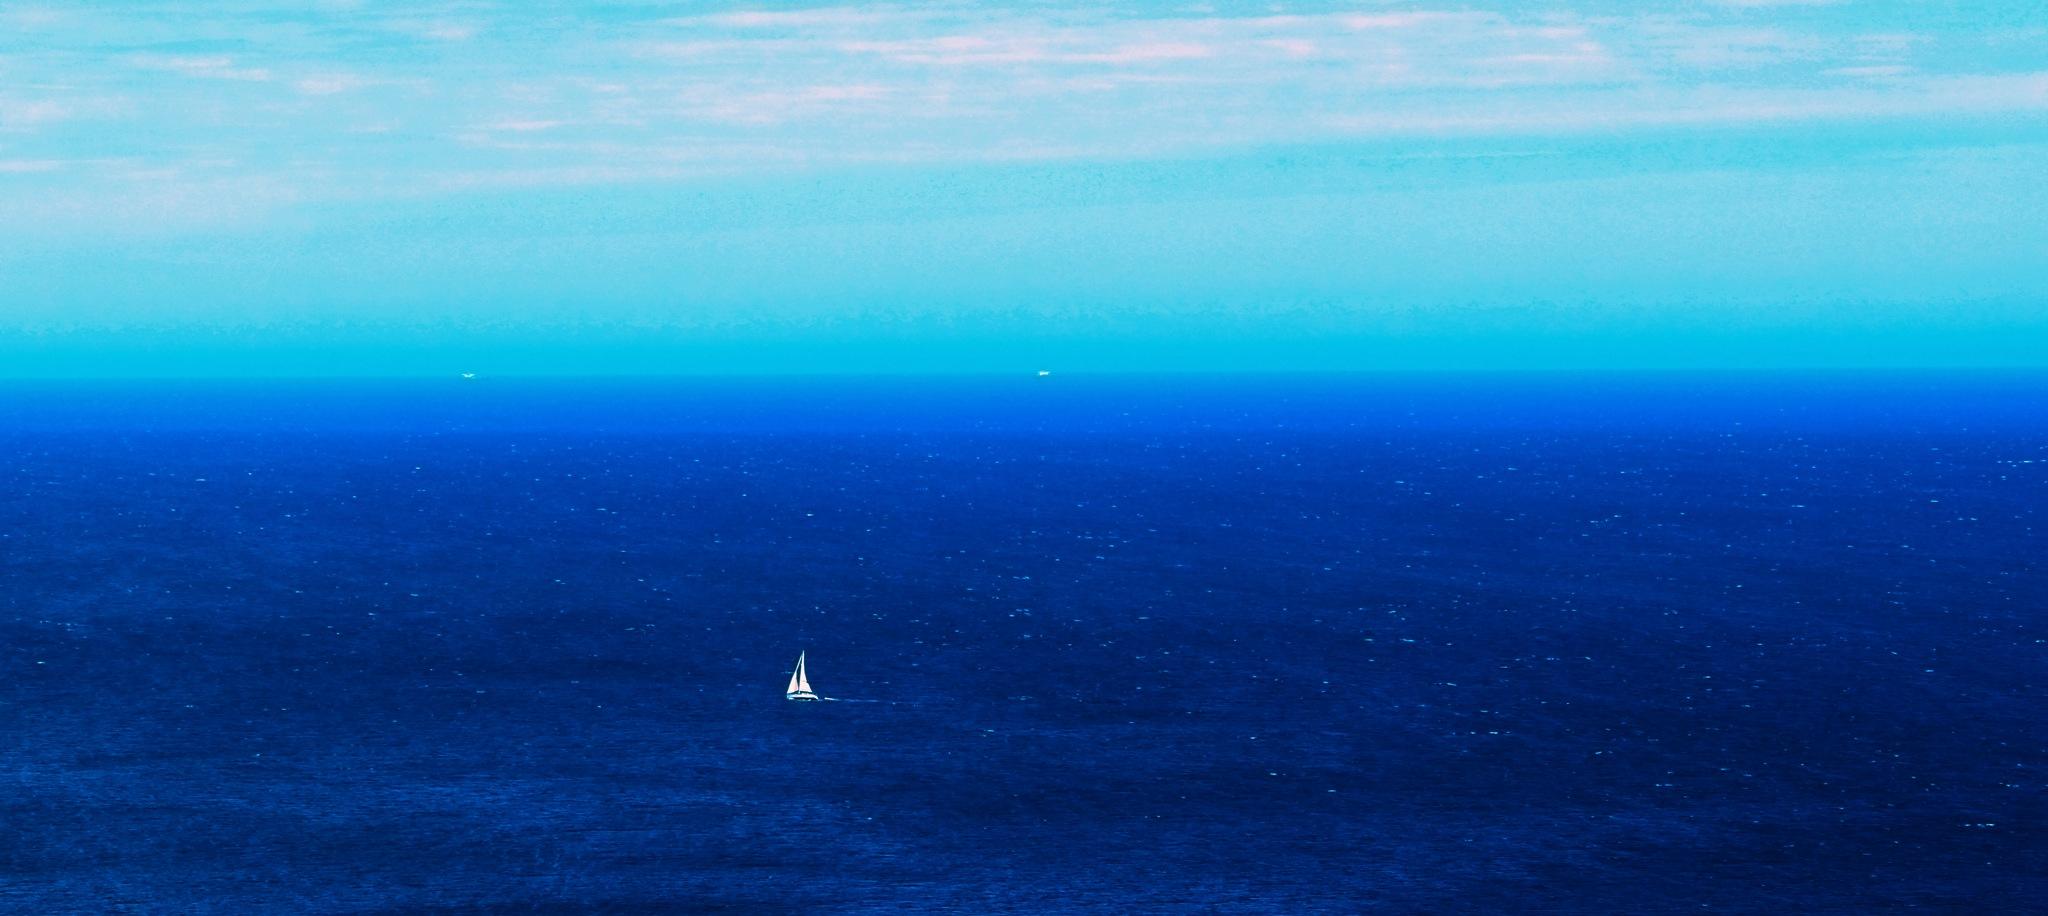 endless blues  by Loreta Tavoraite